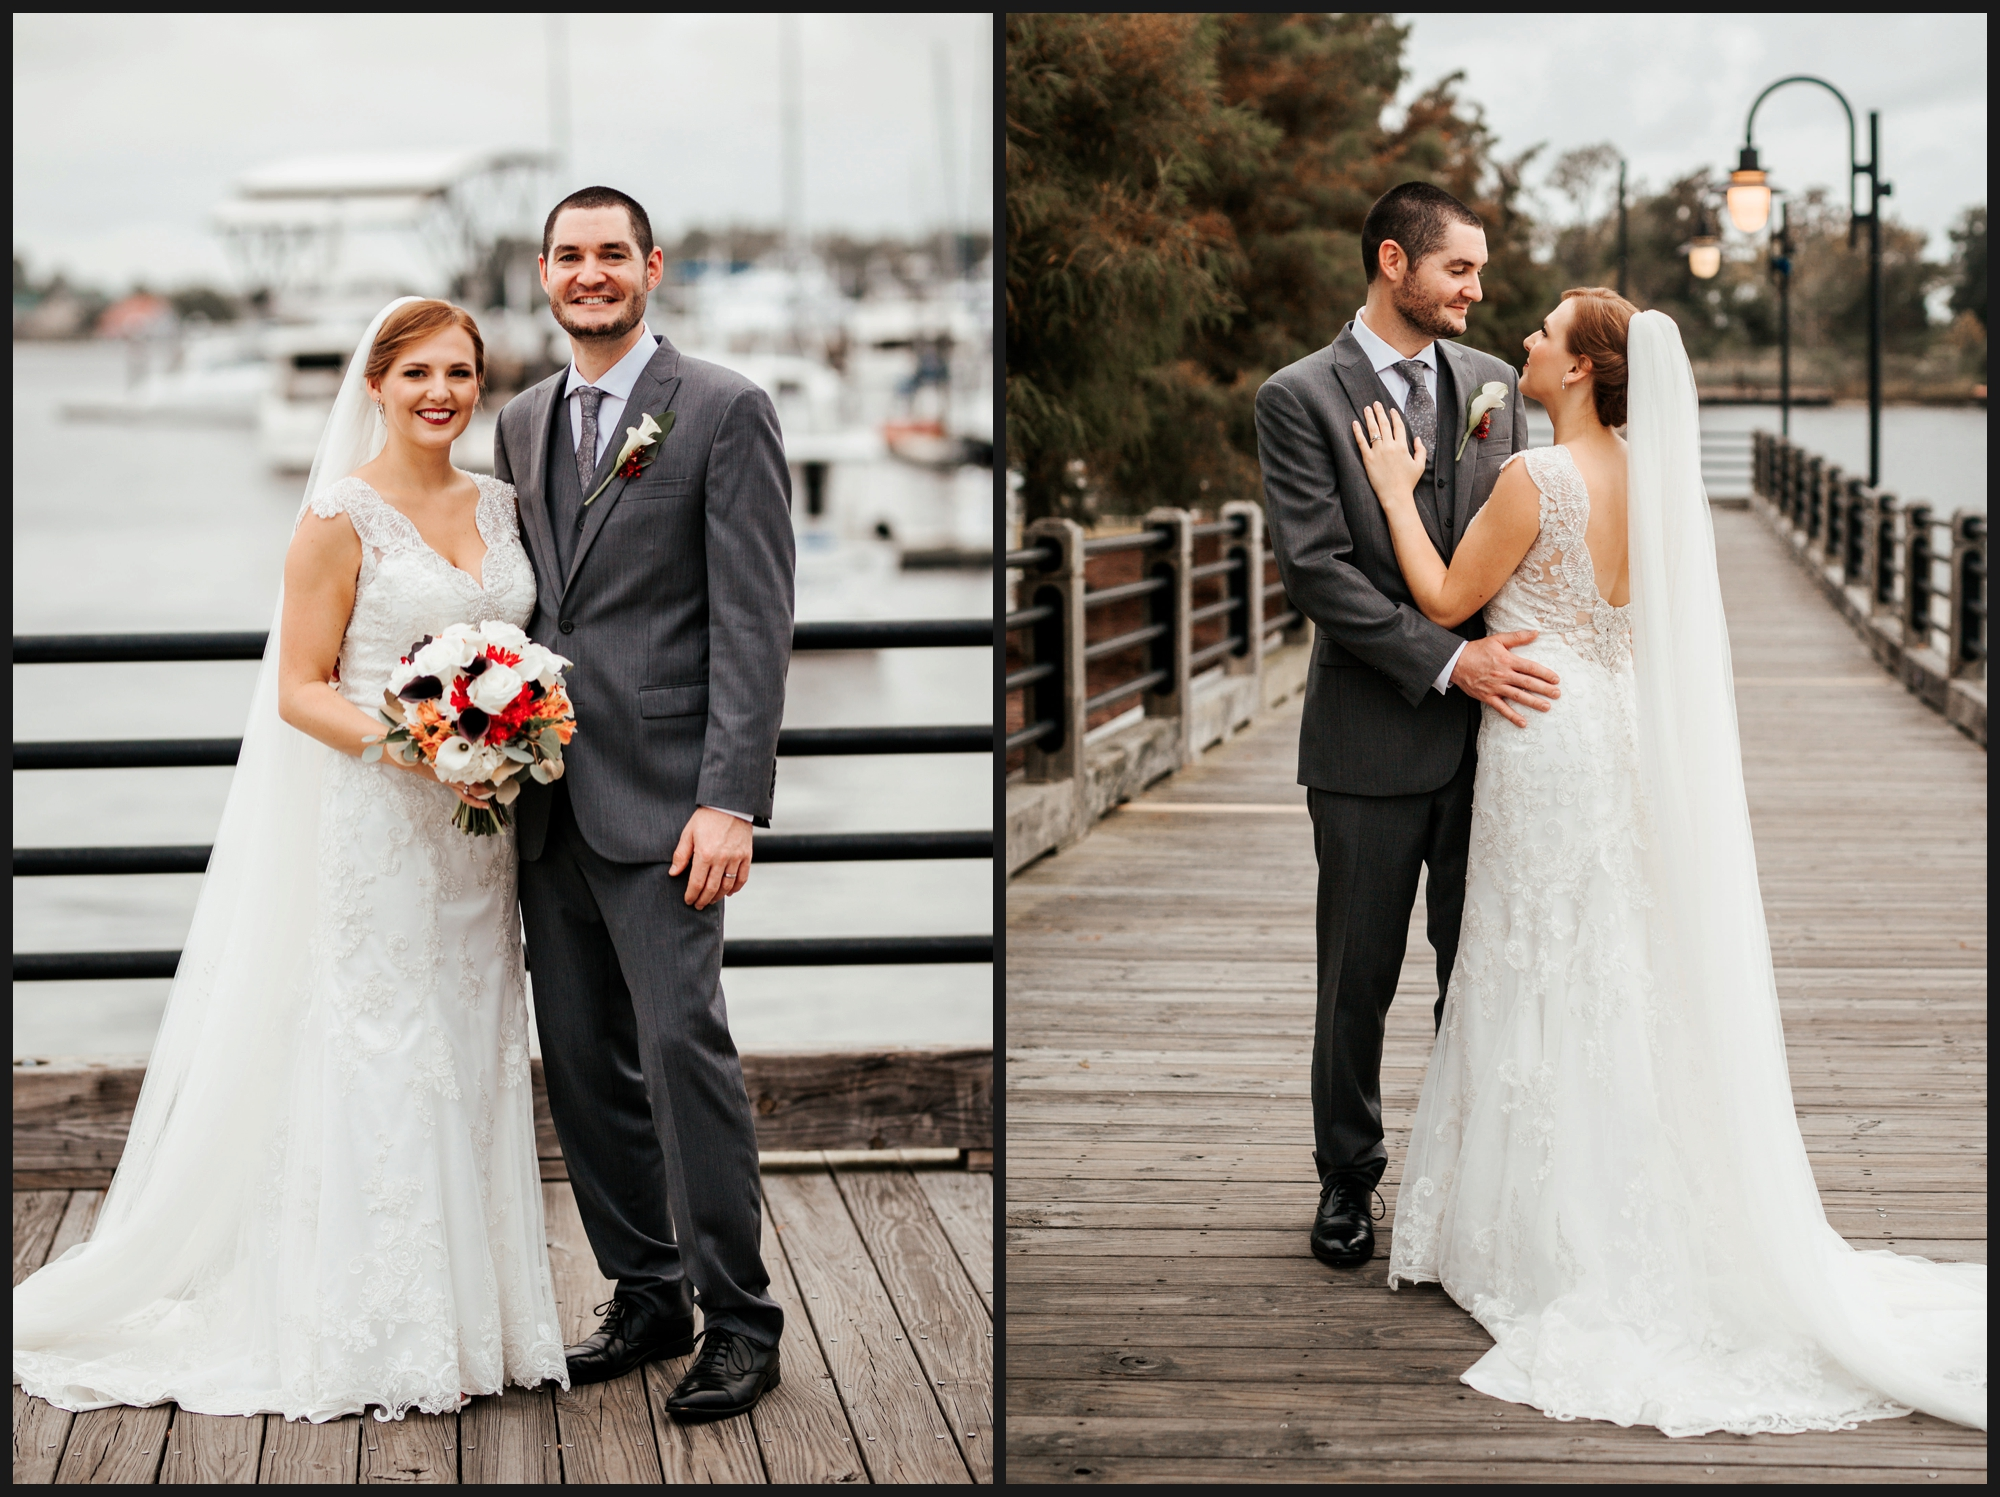 Orlando-Wedding-Photographer-destination-wedding-photographer-florida-wedding-photographer-bohemian-wedding-photographer_0563.jpg